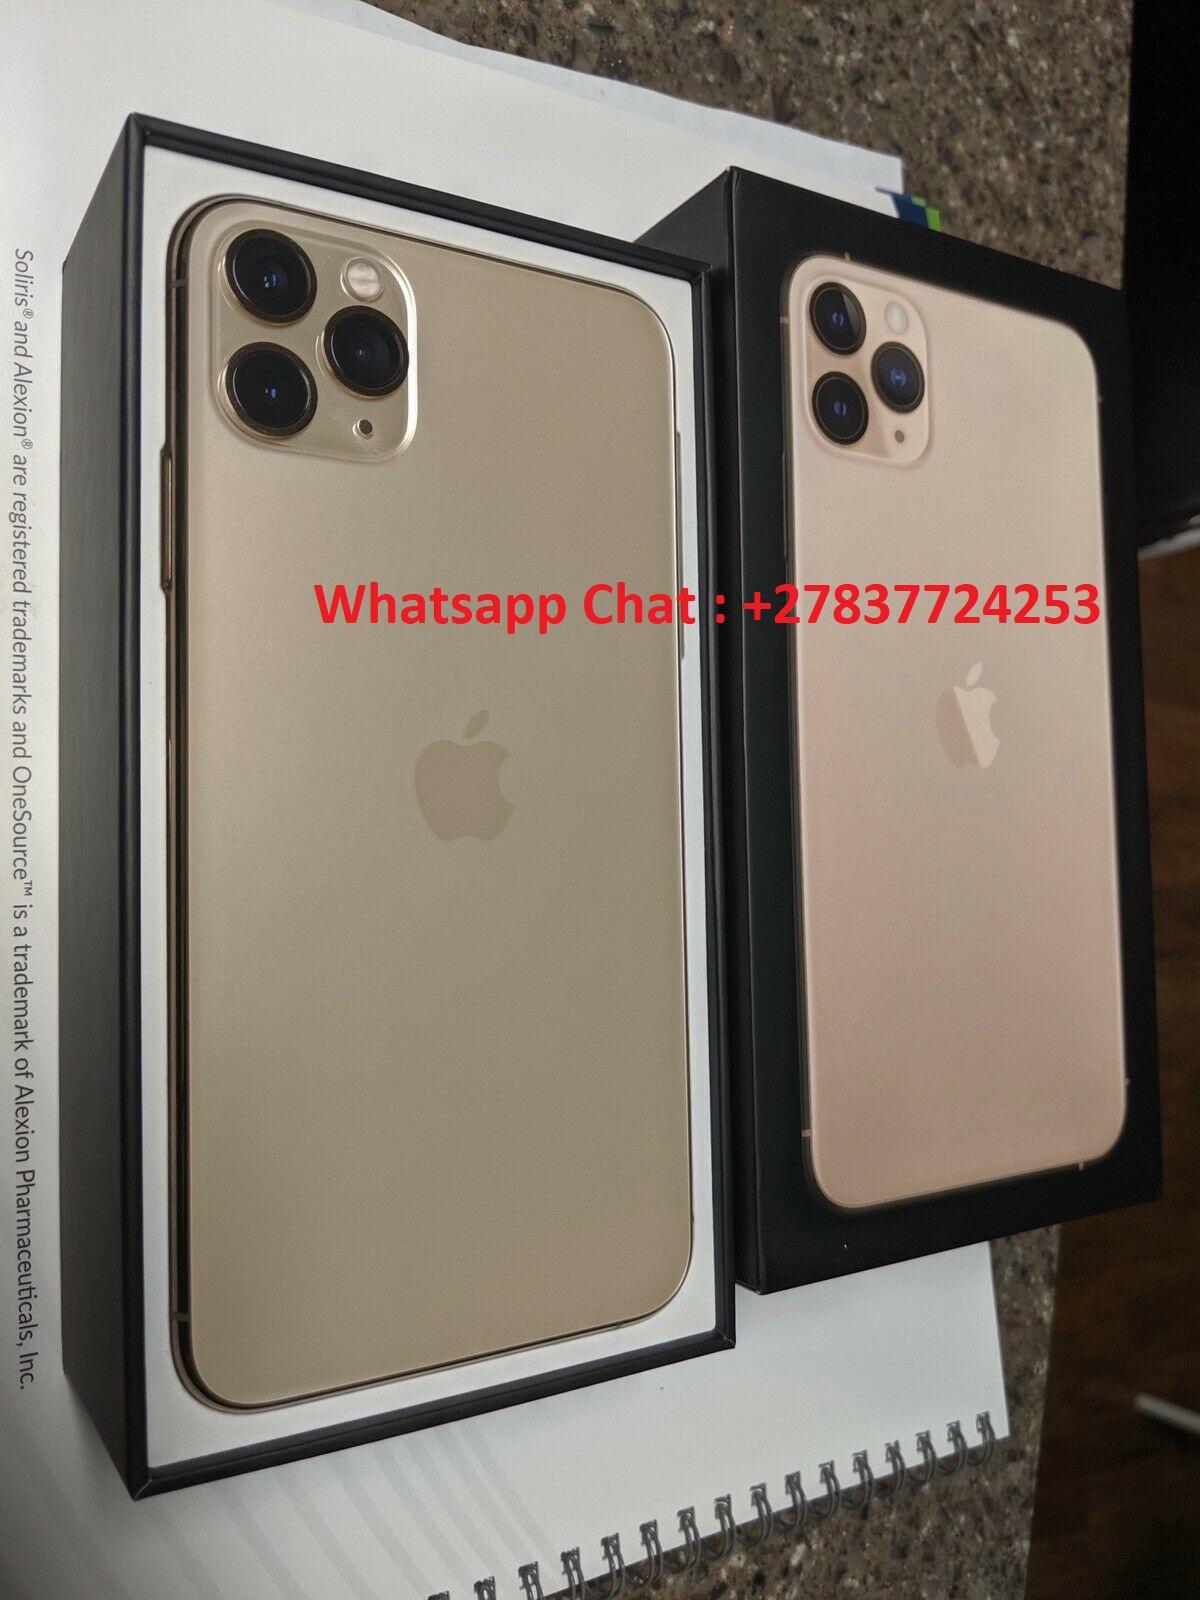 Apple iPhone 11 Pro 64GB = $600, iPhone 11 Pro Max 64GB = $650, iPhone 11 64GB = $470, iPhone XS 64GB = $450 , iPhone XS Max 64GB = $480 , Whatsapp Chat : +27837724253